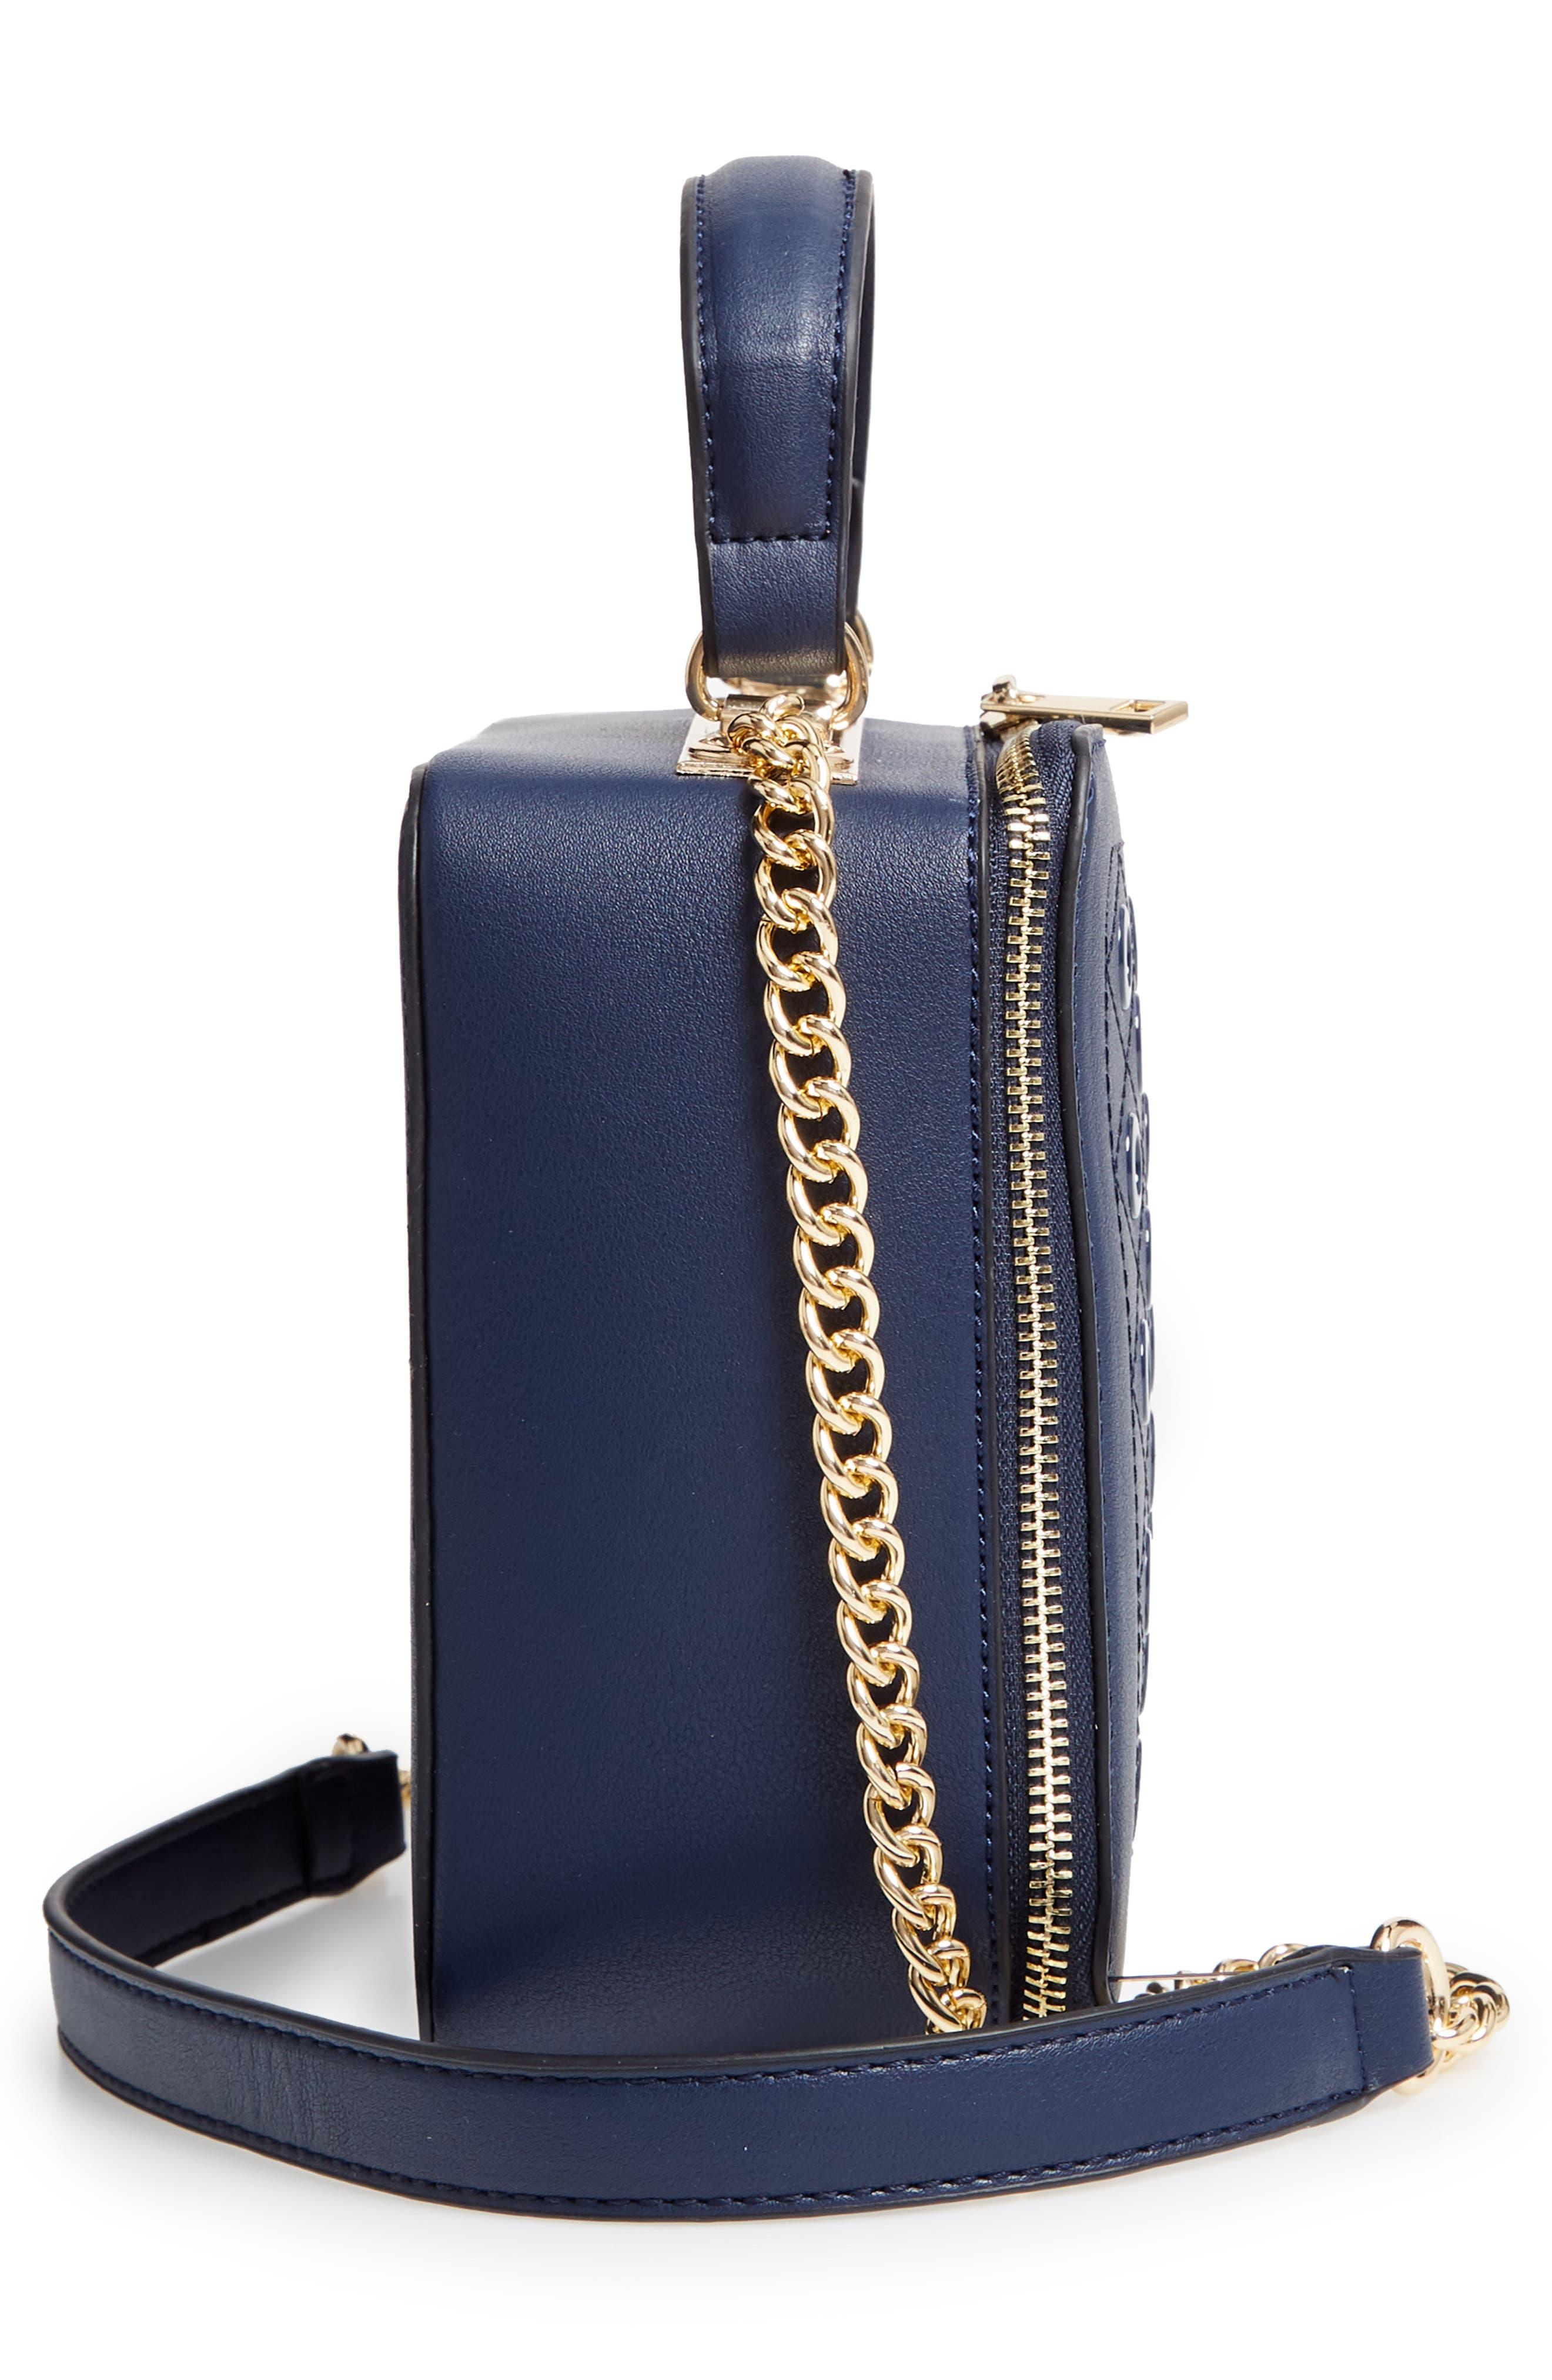 Grommet Detail Faux Leather Crossbody Bag,                             Alternate thumbnail 5, color,                             400